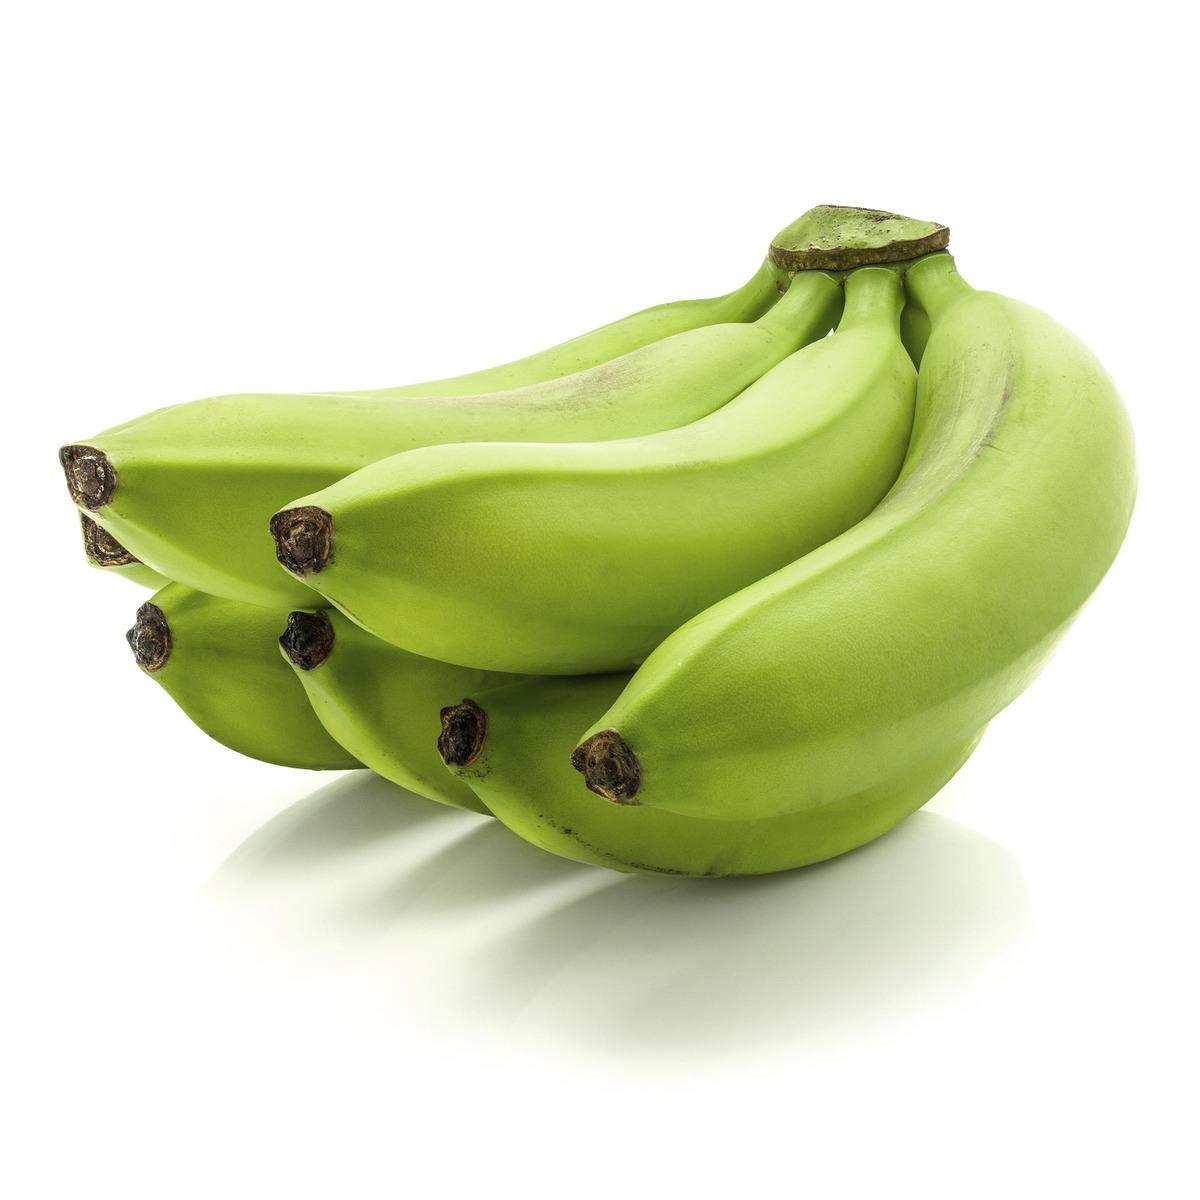 Export Grade Cavendish Bananas - Fresh Cavendish Banana